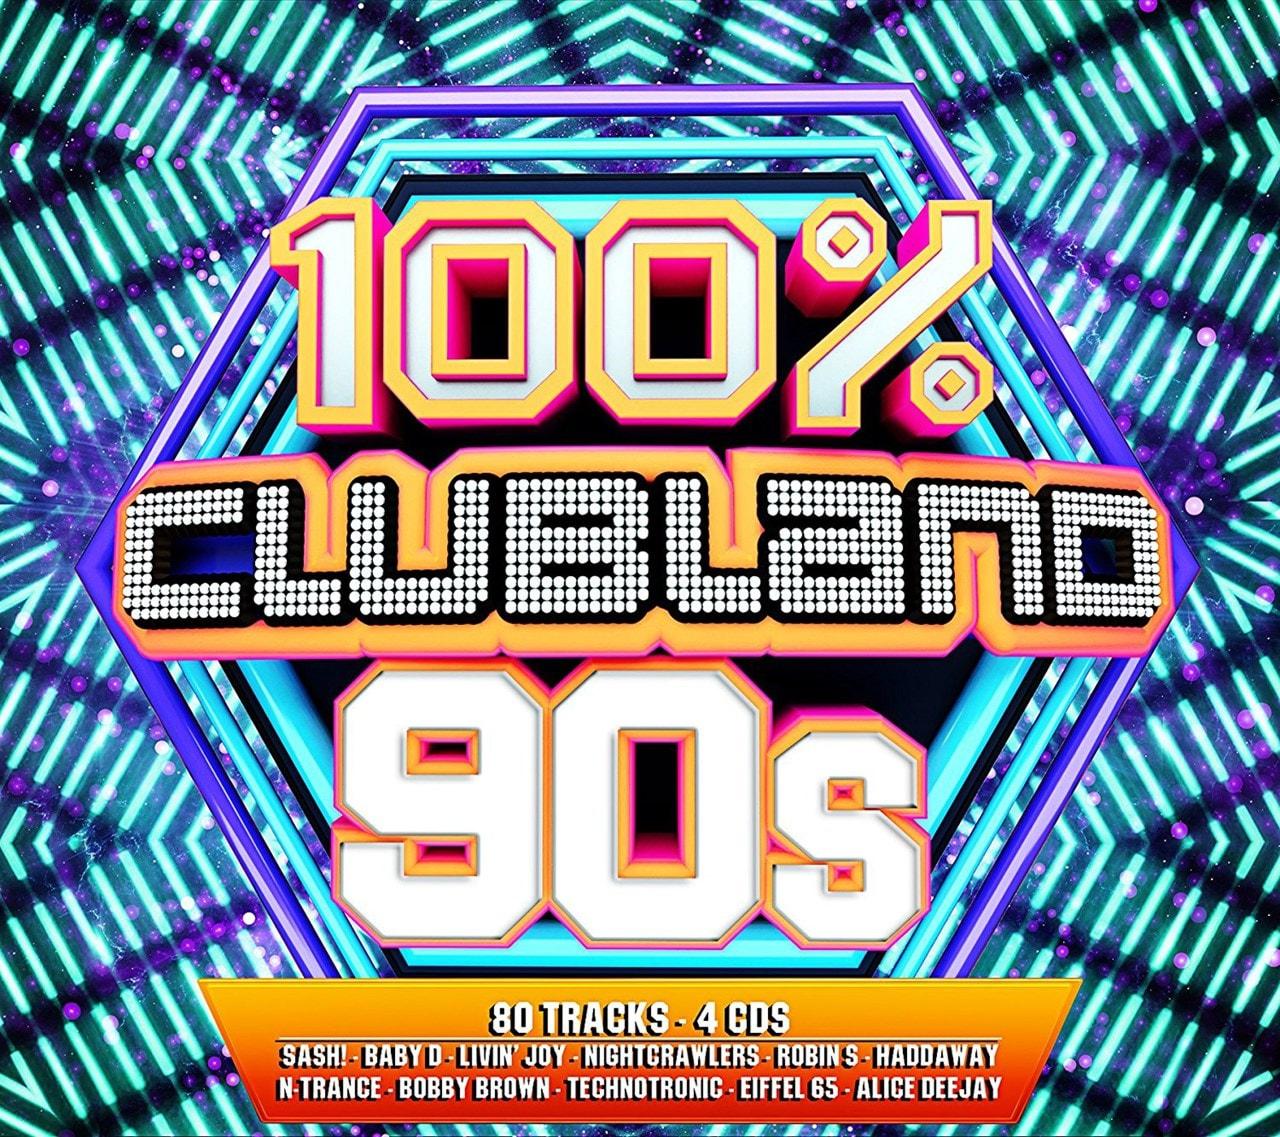 Clubland 100% 90s - 1